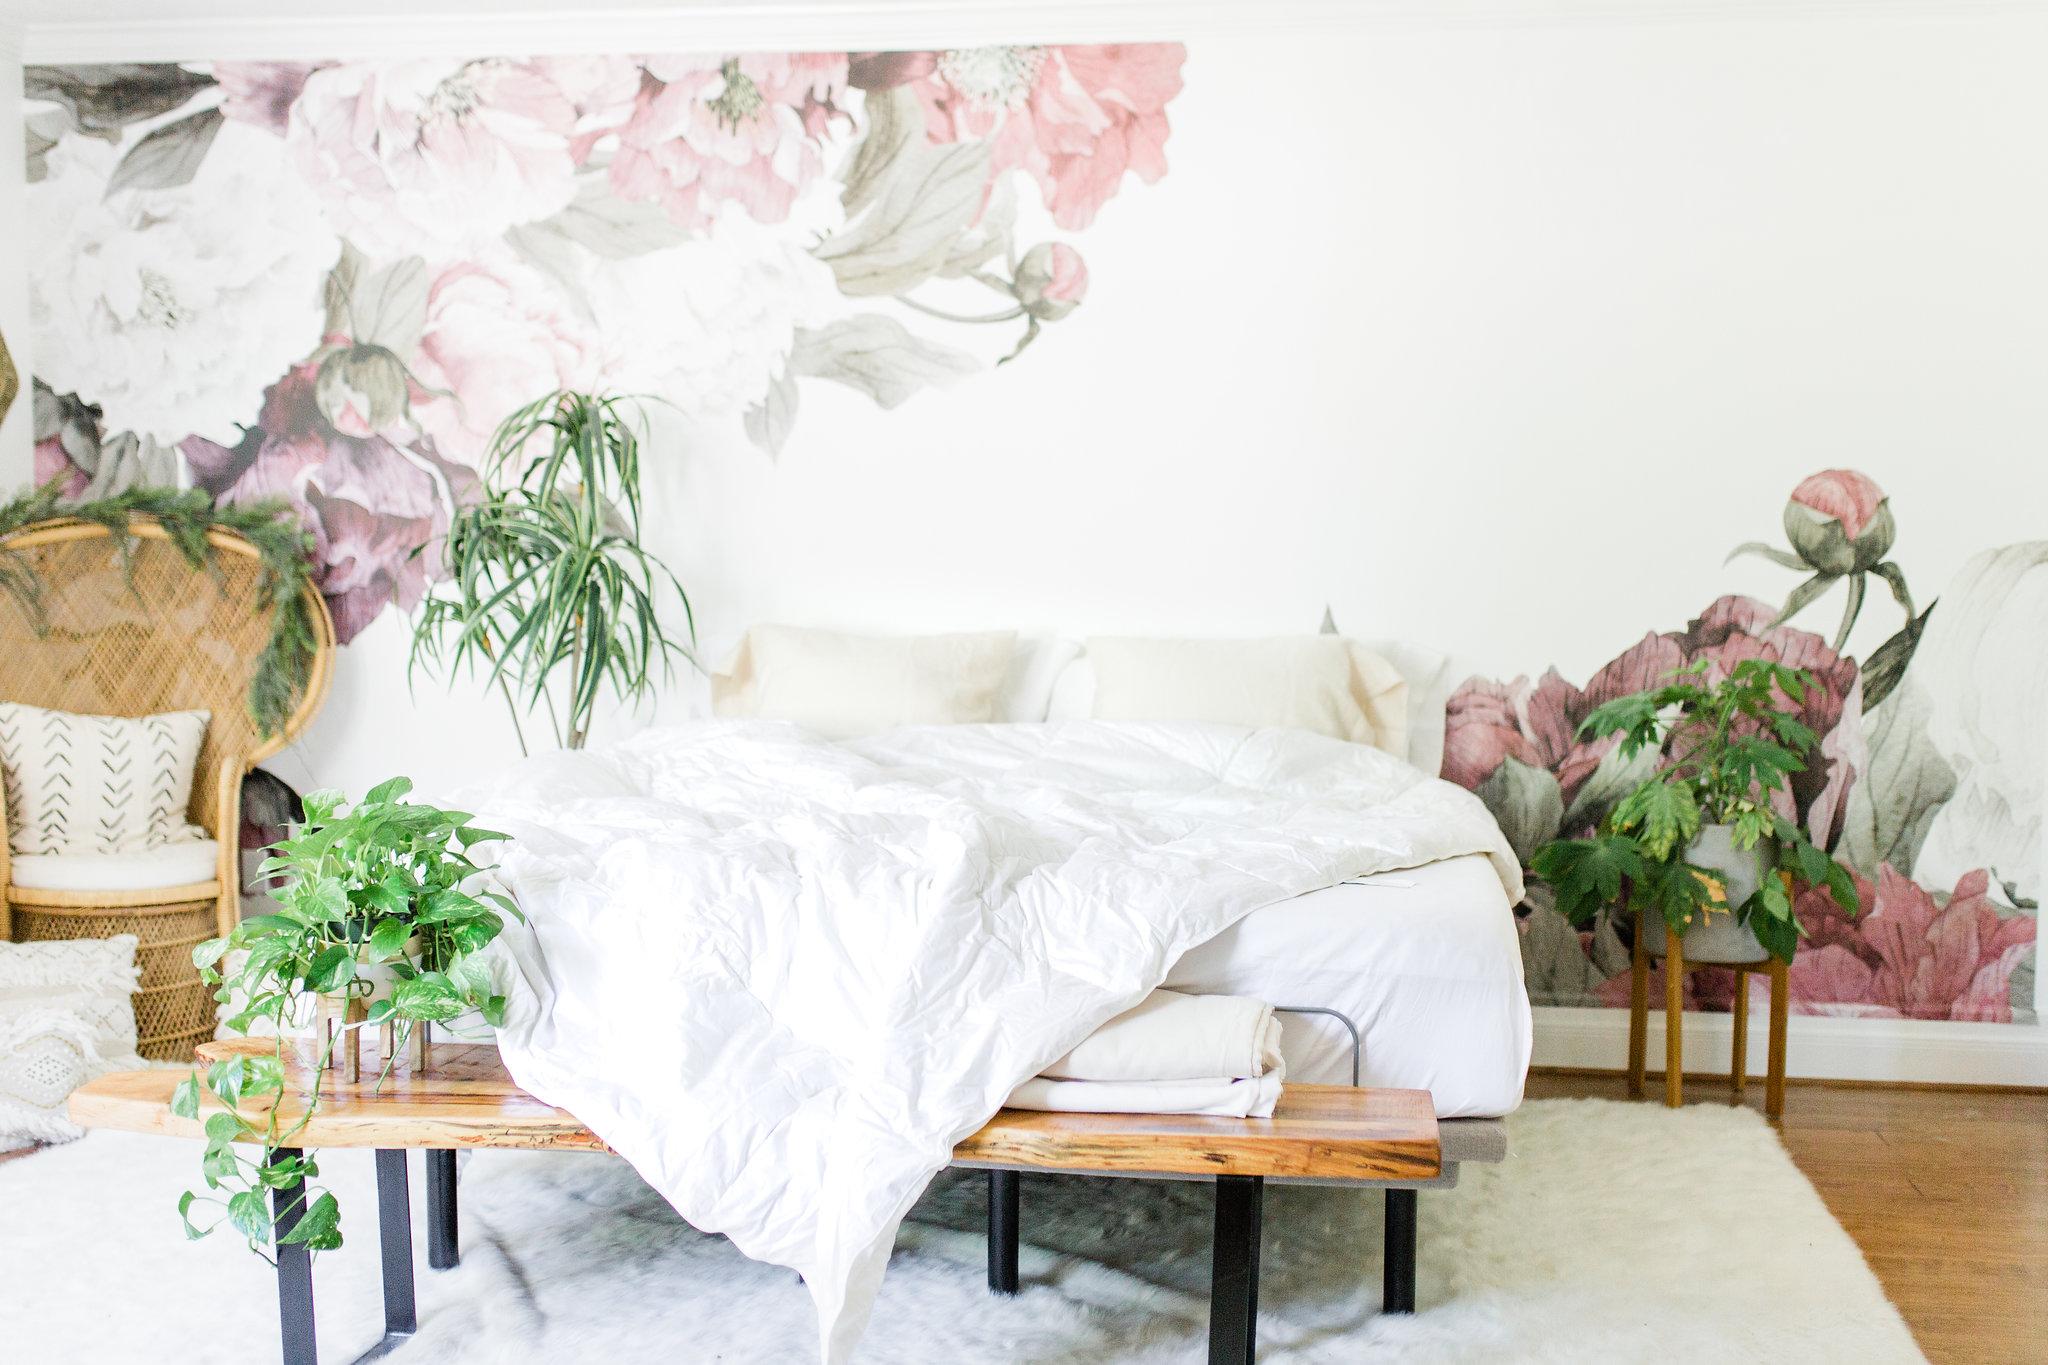 How to Get Better Sleep 3 Quality Bedding Basics To Build your Sanctuary The Company Store Review Joyfullygreen 4 linen duvet cover boho bedroom.jpg